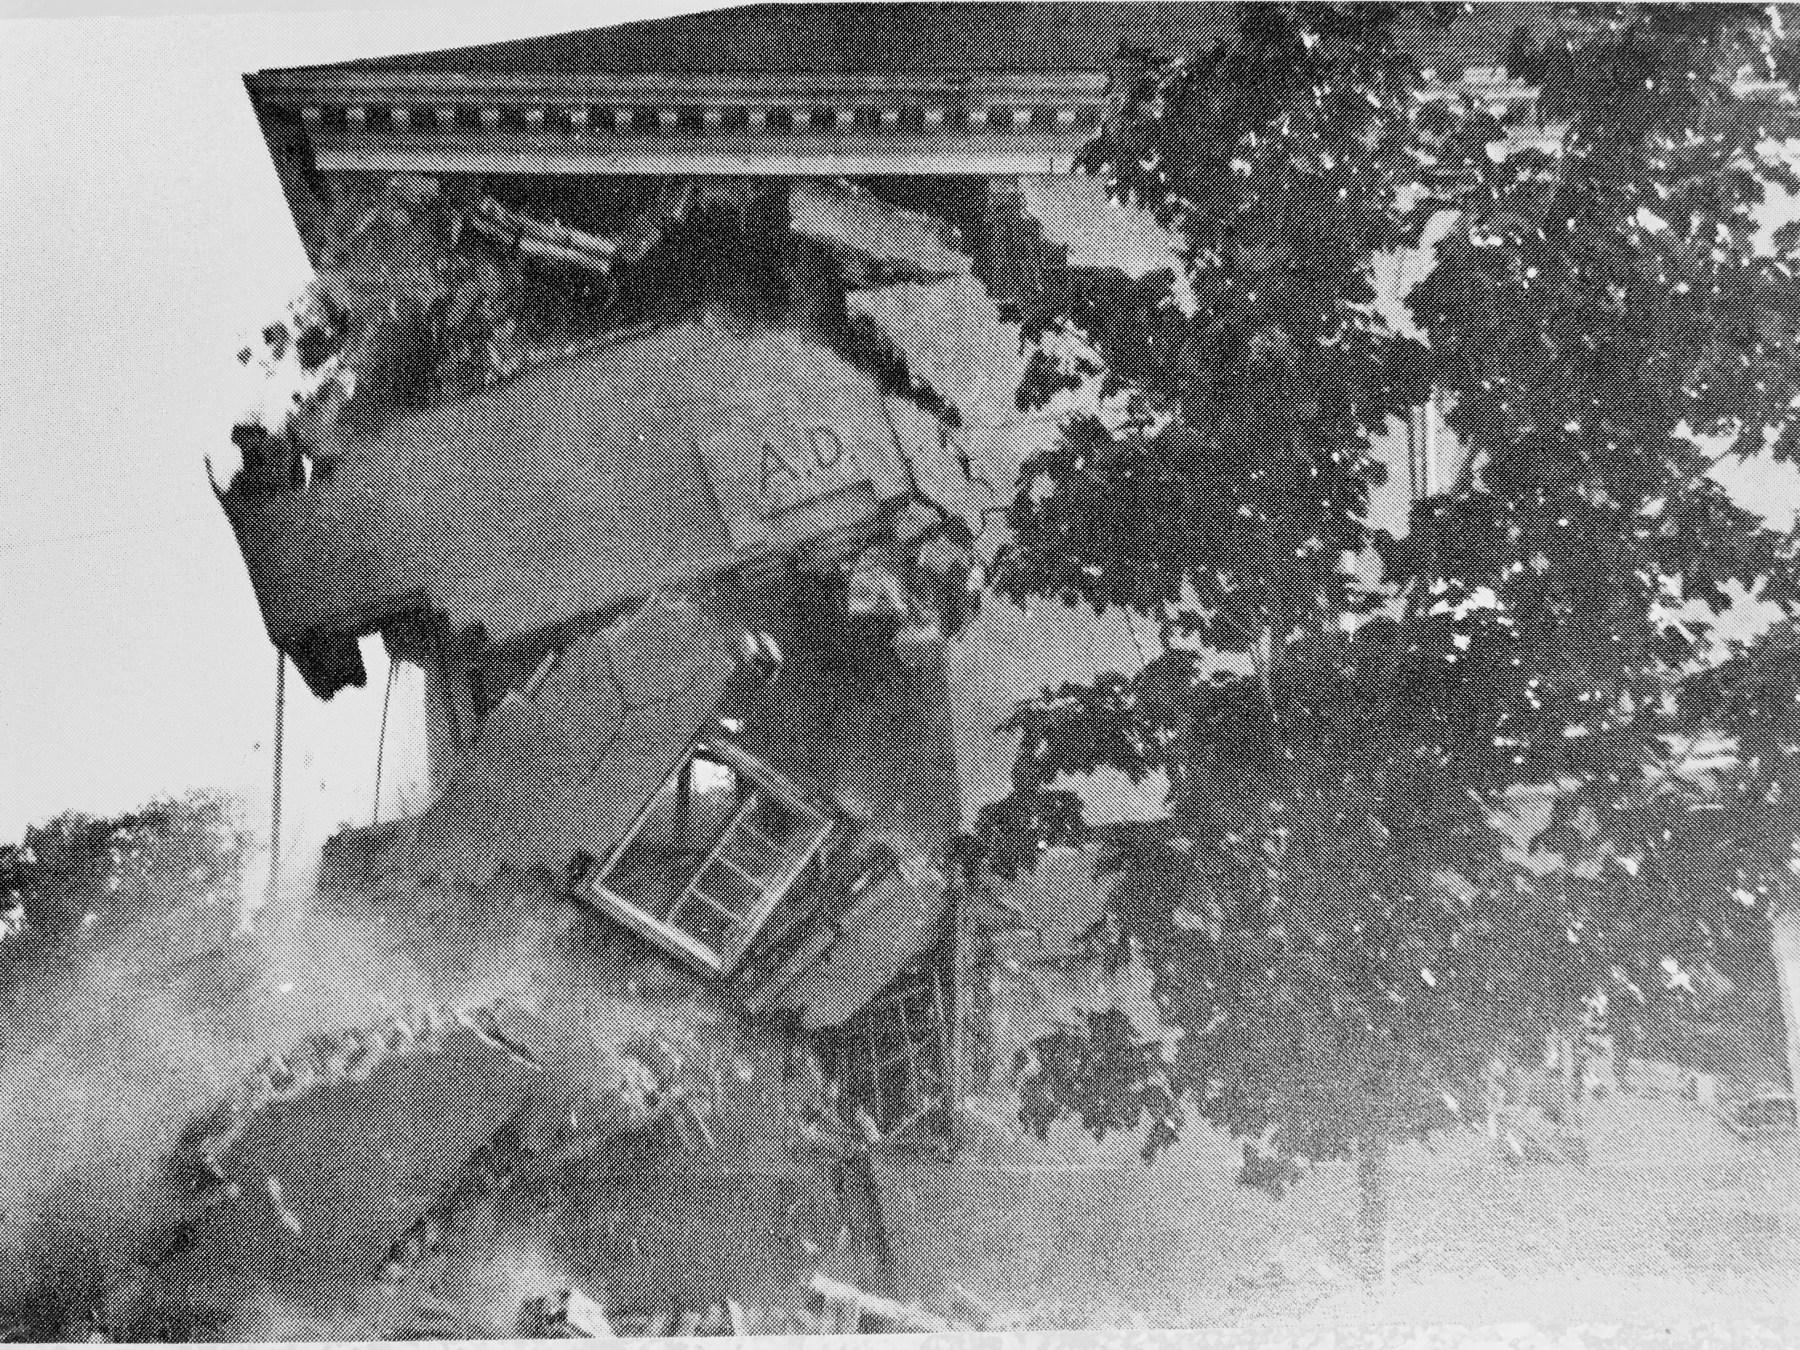 Town Hall demolition, 1969. Burlington MA